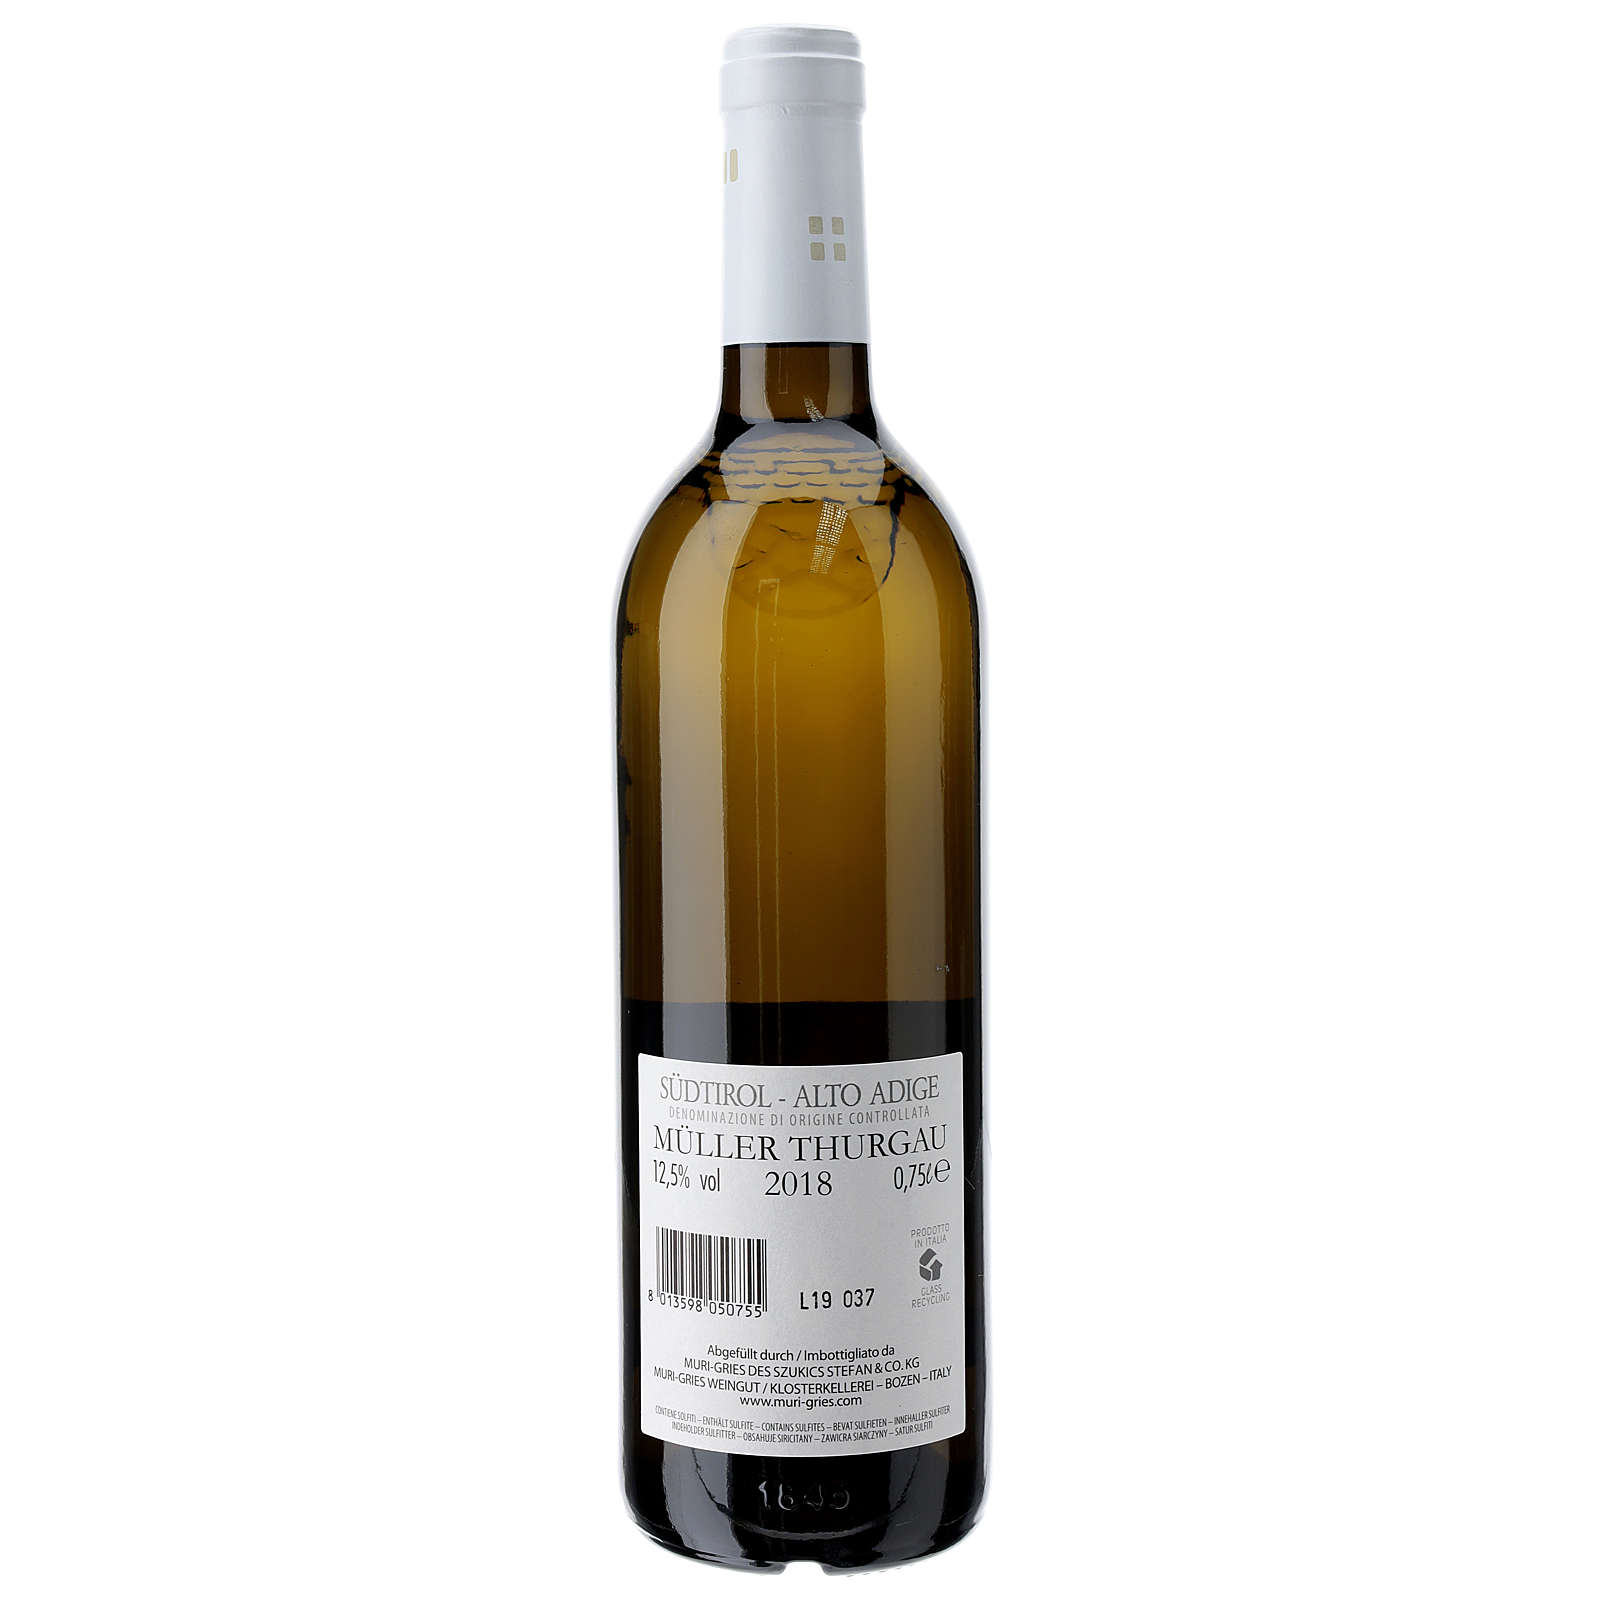 Vin Muller Thurgau DOC 2018 Abbaye Muri Gries 750ml 3